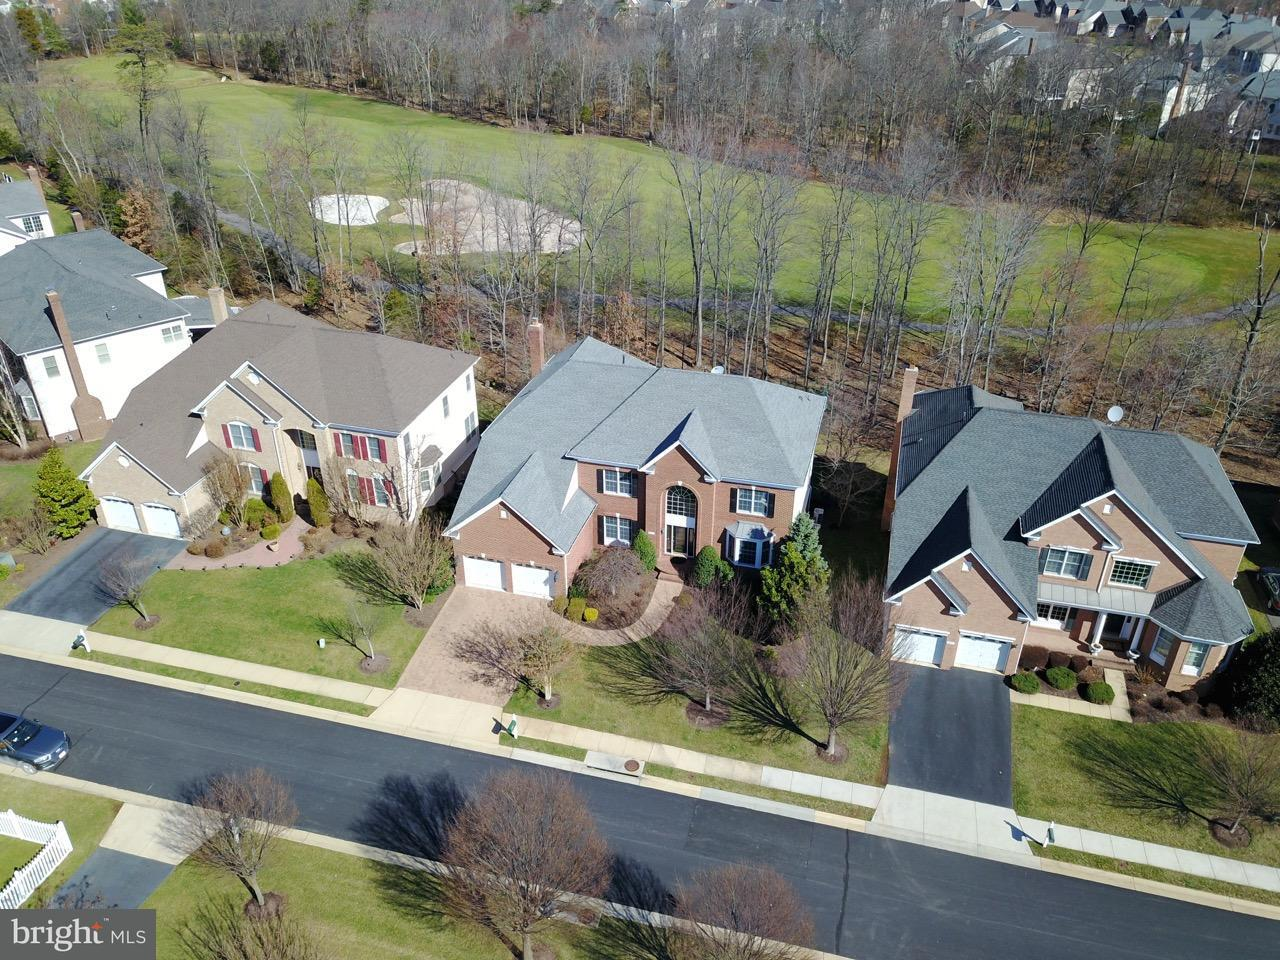 Single Family Home for Sale at 20319 Kiawah Island Drive 20319 Kiawah Island Drive Ashburn, Virginia 20147 United States